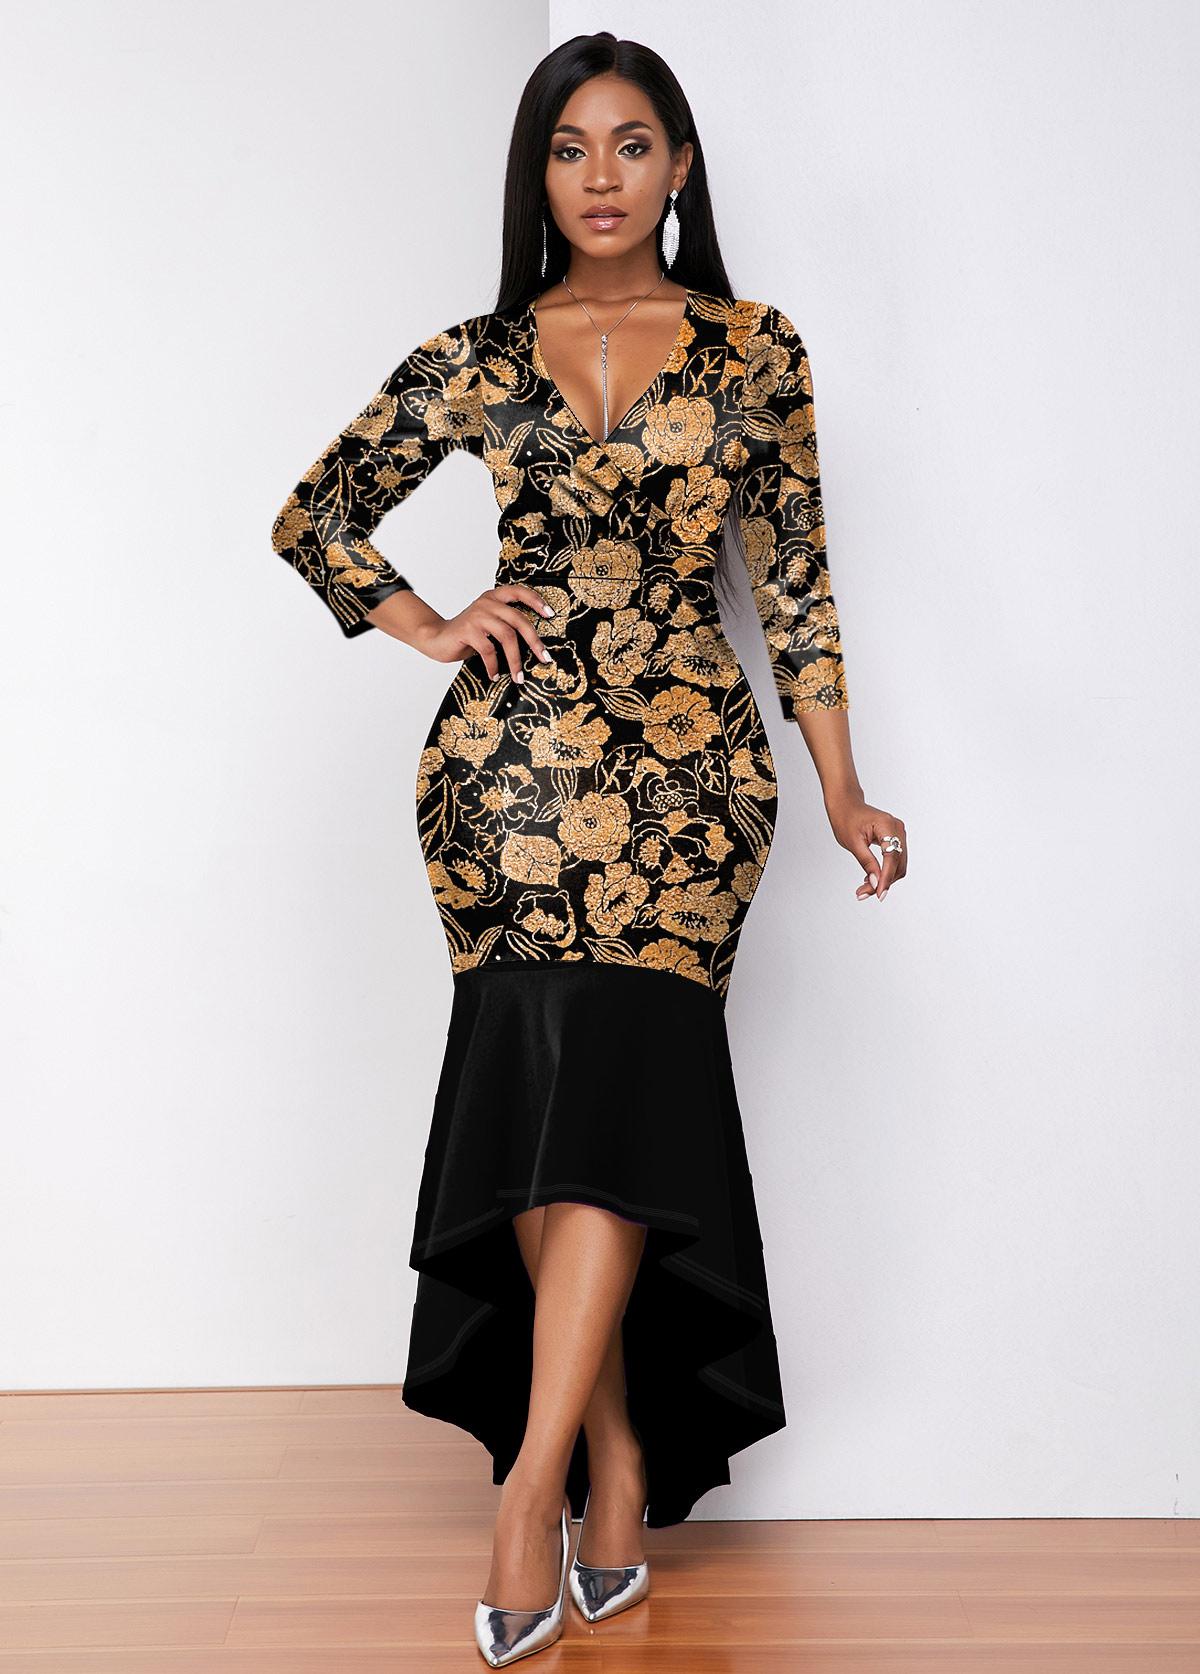 V Neck 3/4 Sleeve Hot Stamping Mermaid Dress